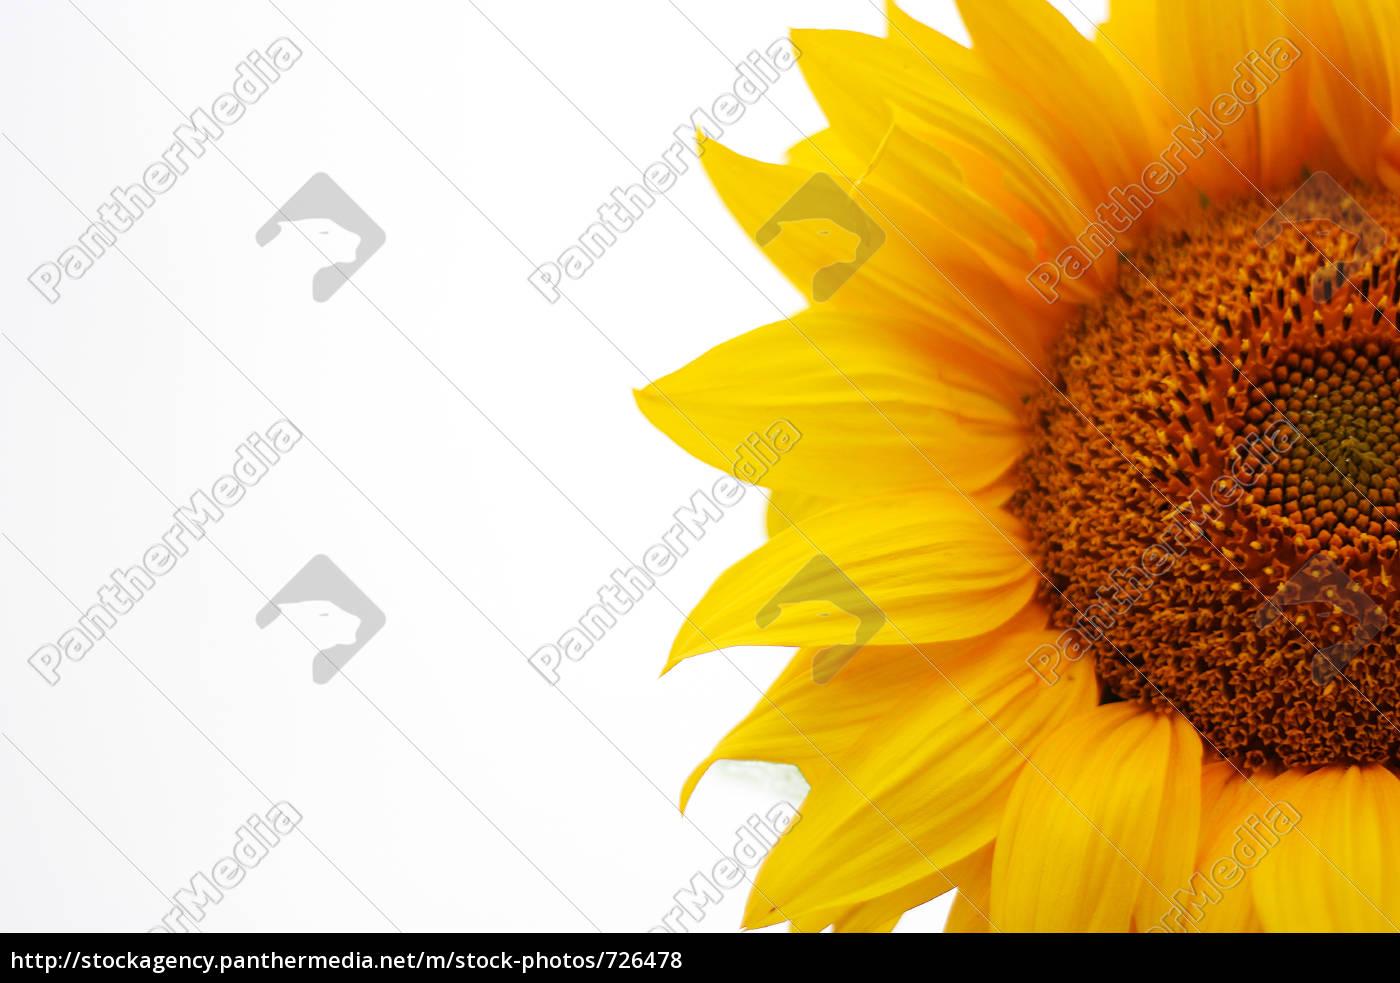 sunflower - 726478